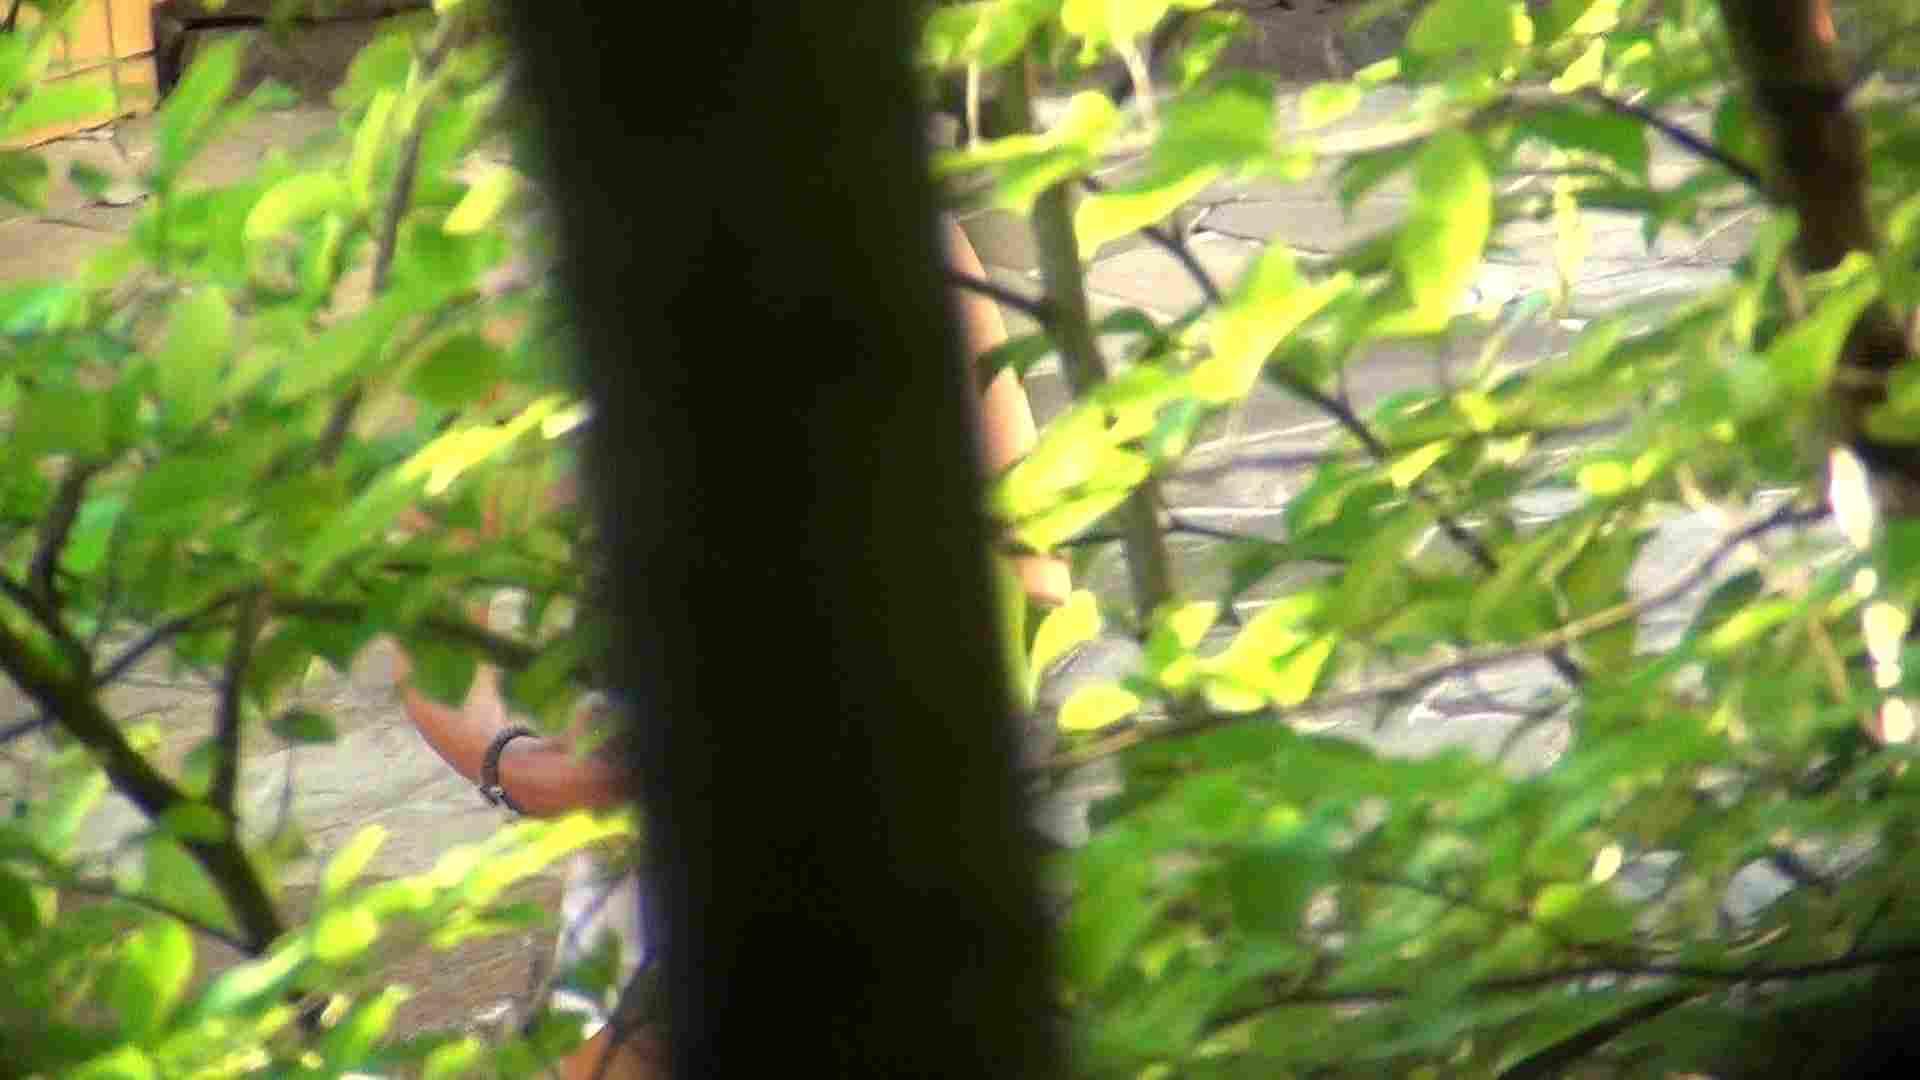 Vol.48 眉間にしわをよせた美人さん 露天風呂の女子達 ぱこり動画紹介 90画像 6